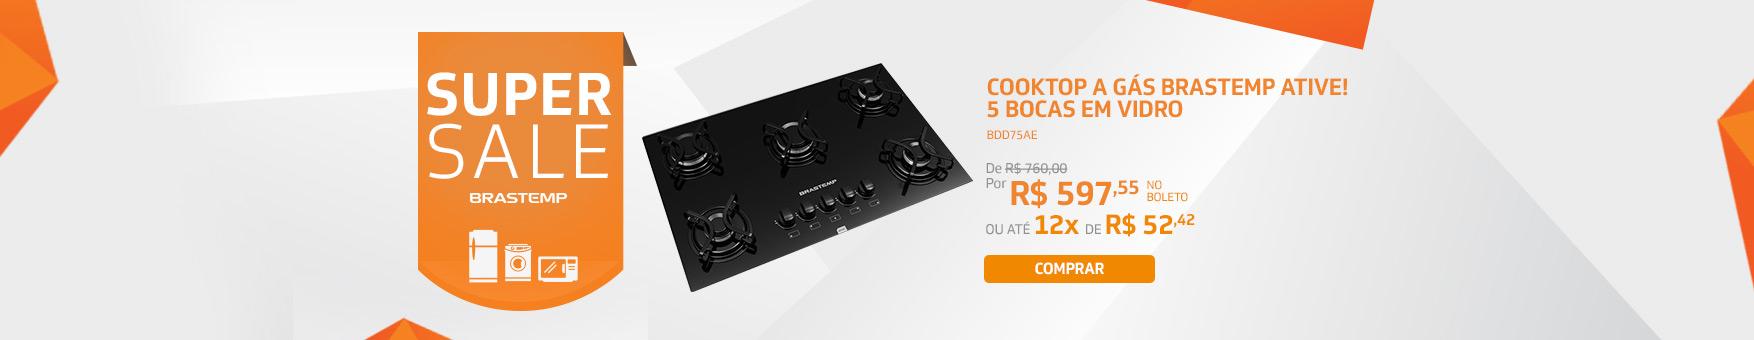 Promoção Interna - 25 - supersale - cooktops - 5